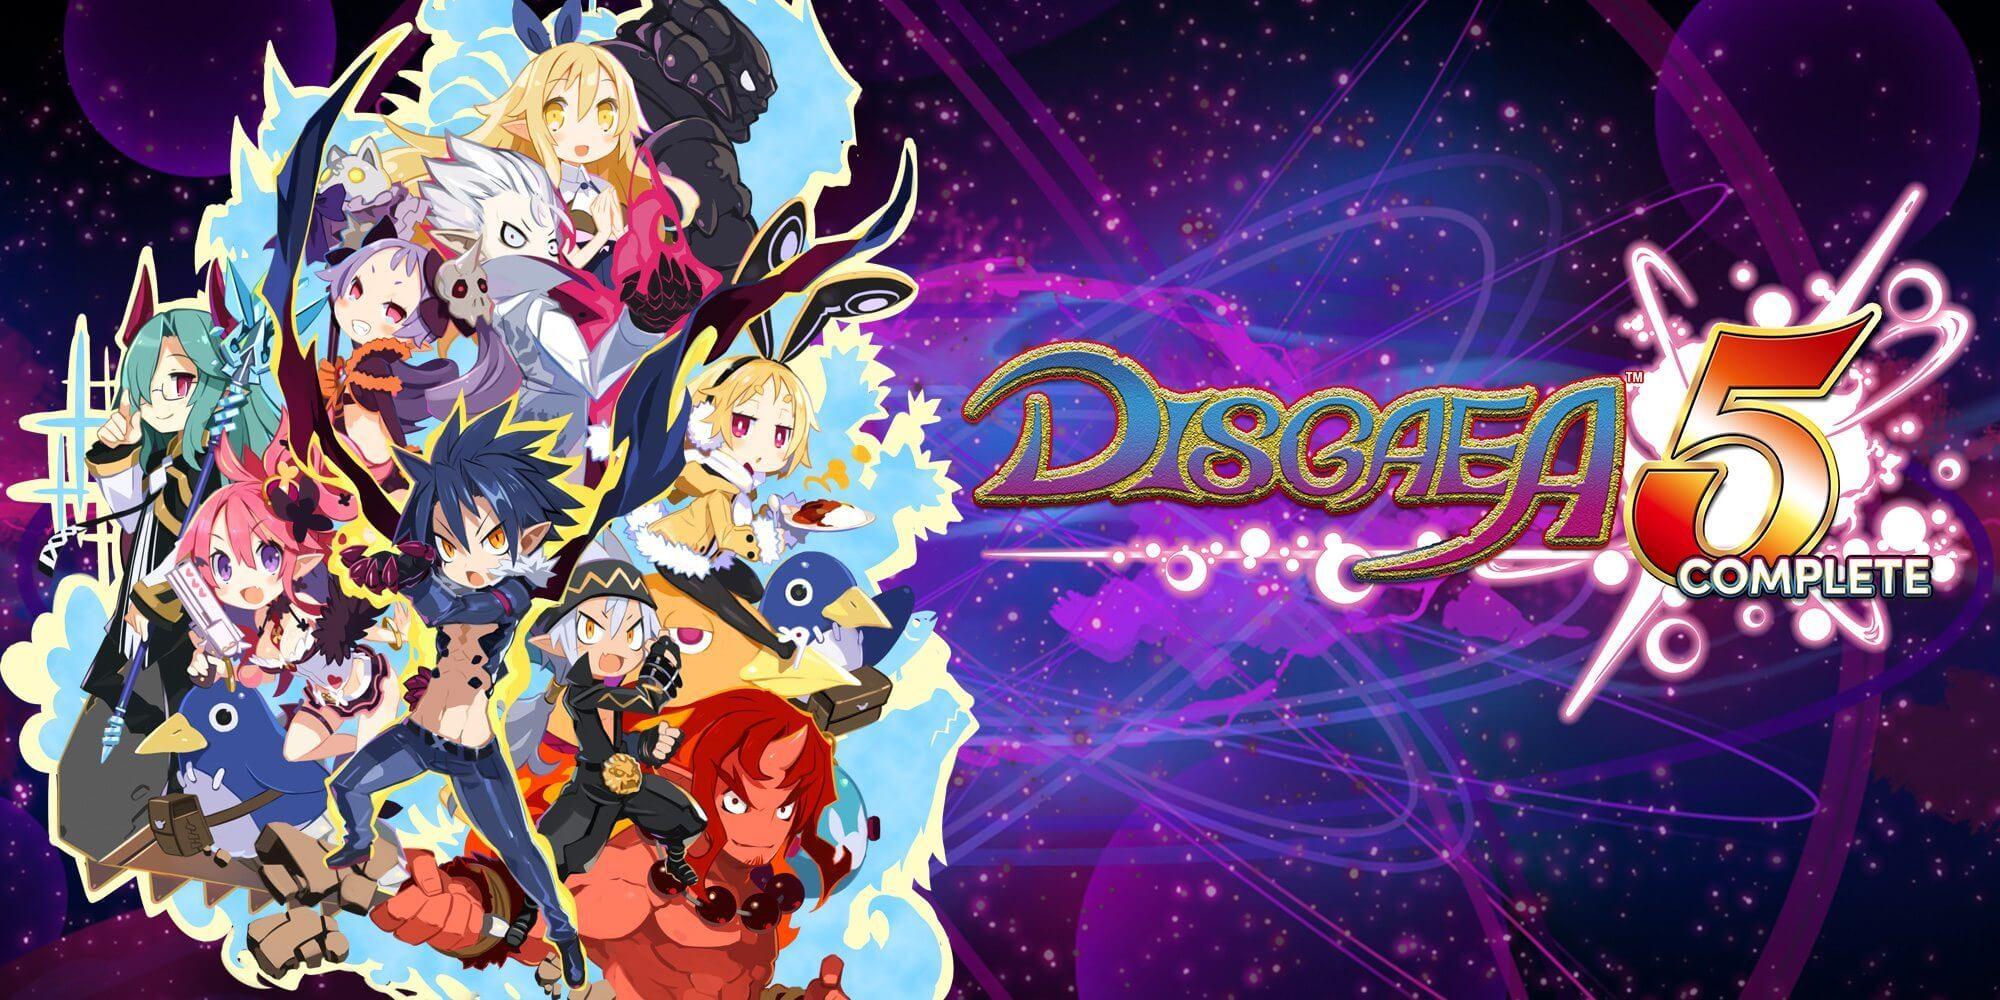 Disgaea 5 Complete - Disgaea 5 Complete é lançado para o Nintendo Switch